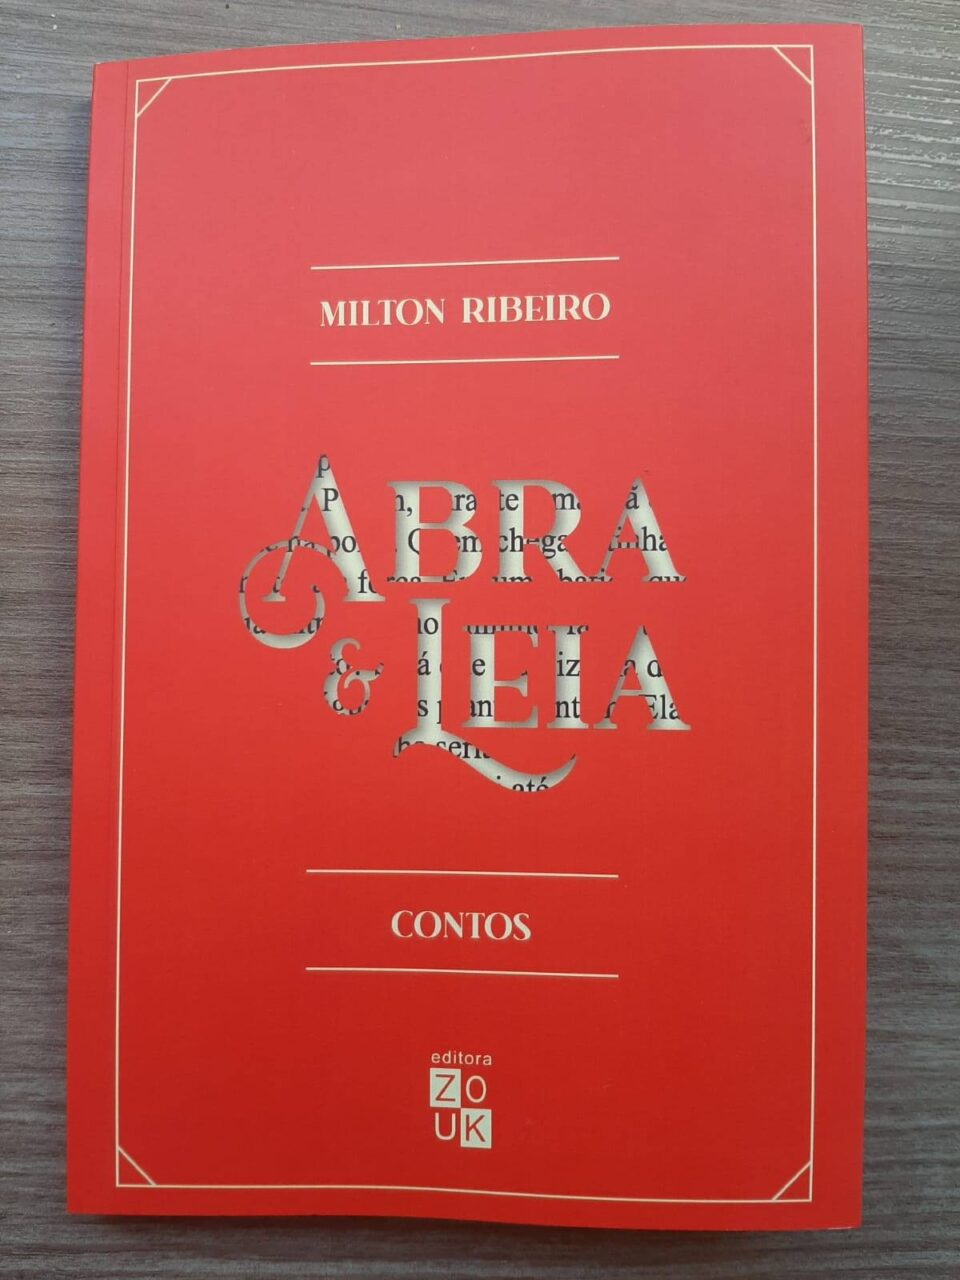 De Luís Augusto Farinatti, sobre Abra e Leia